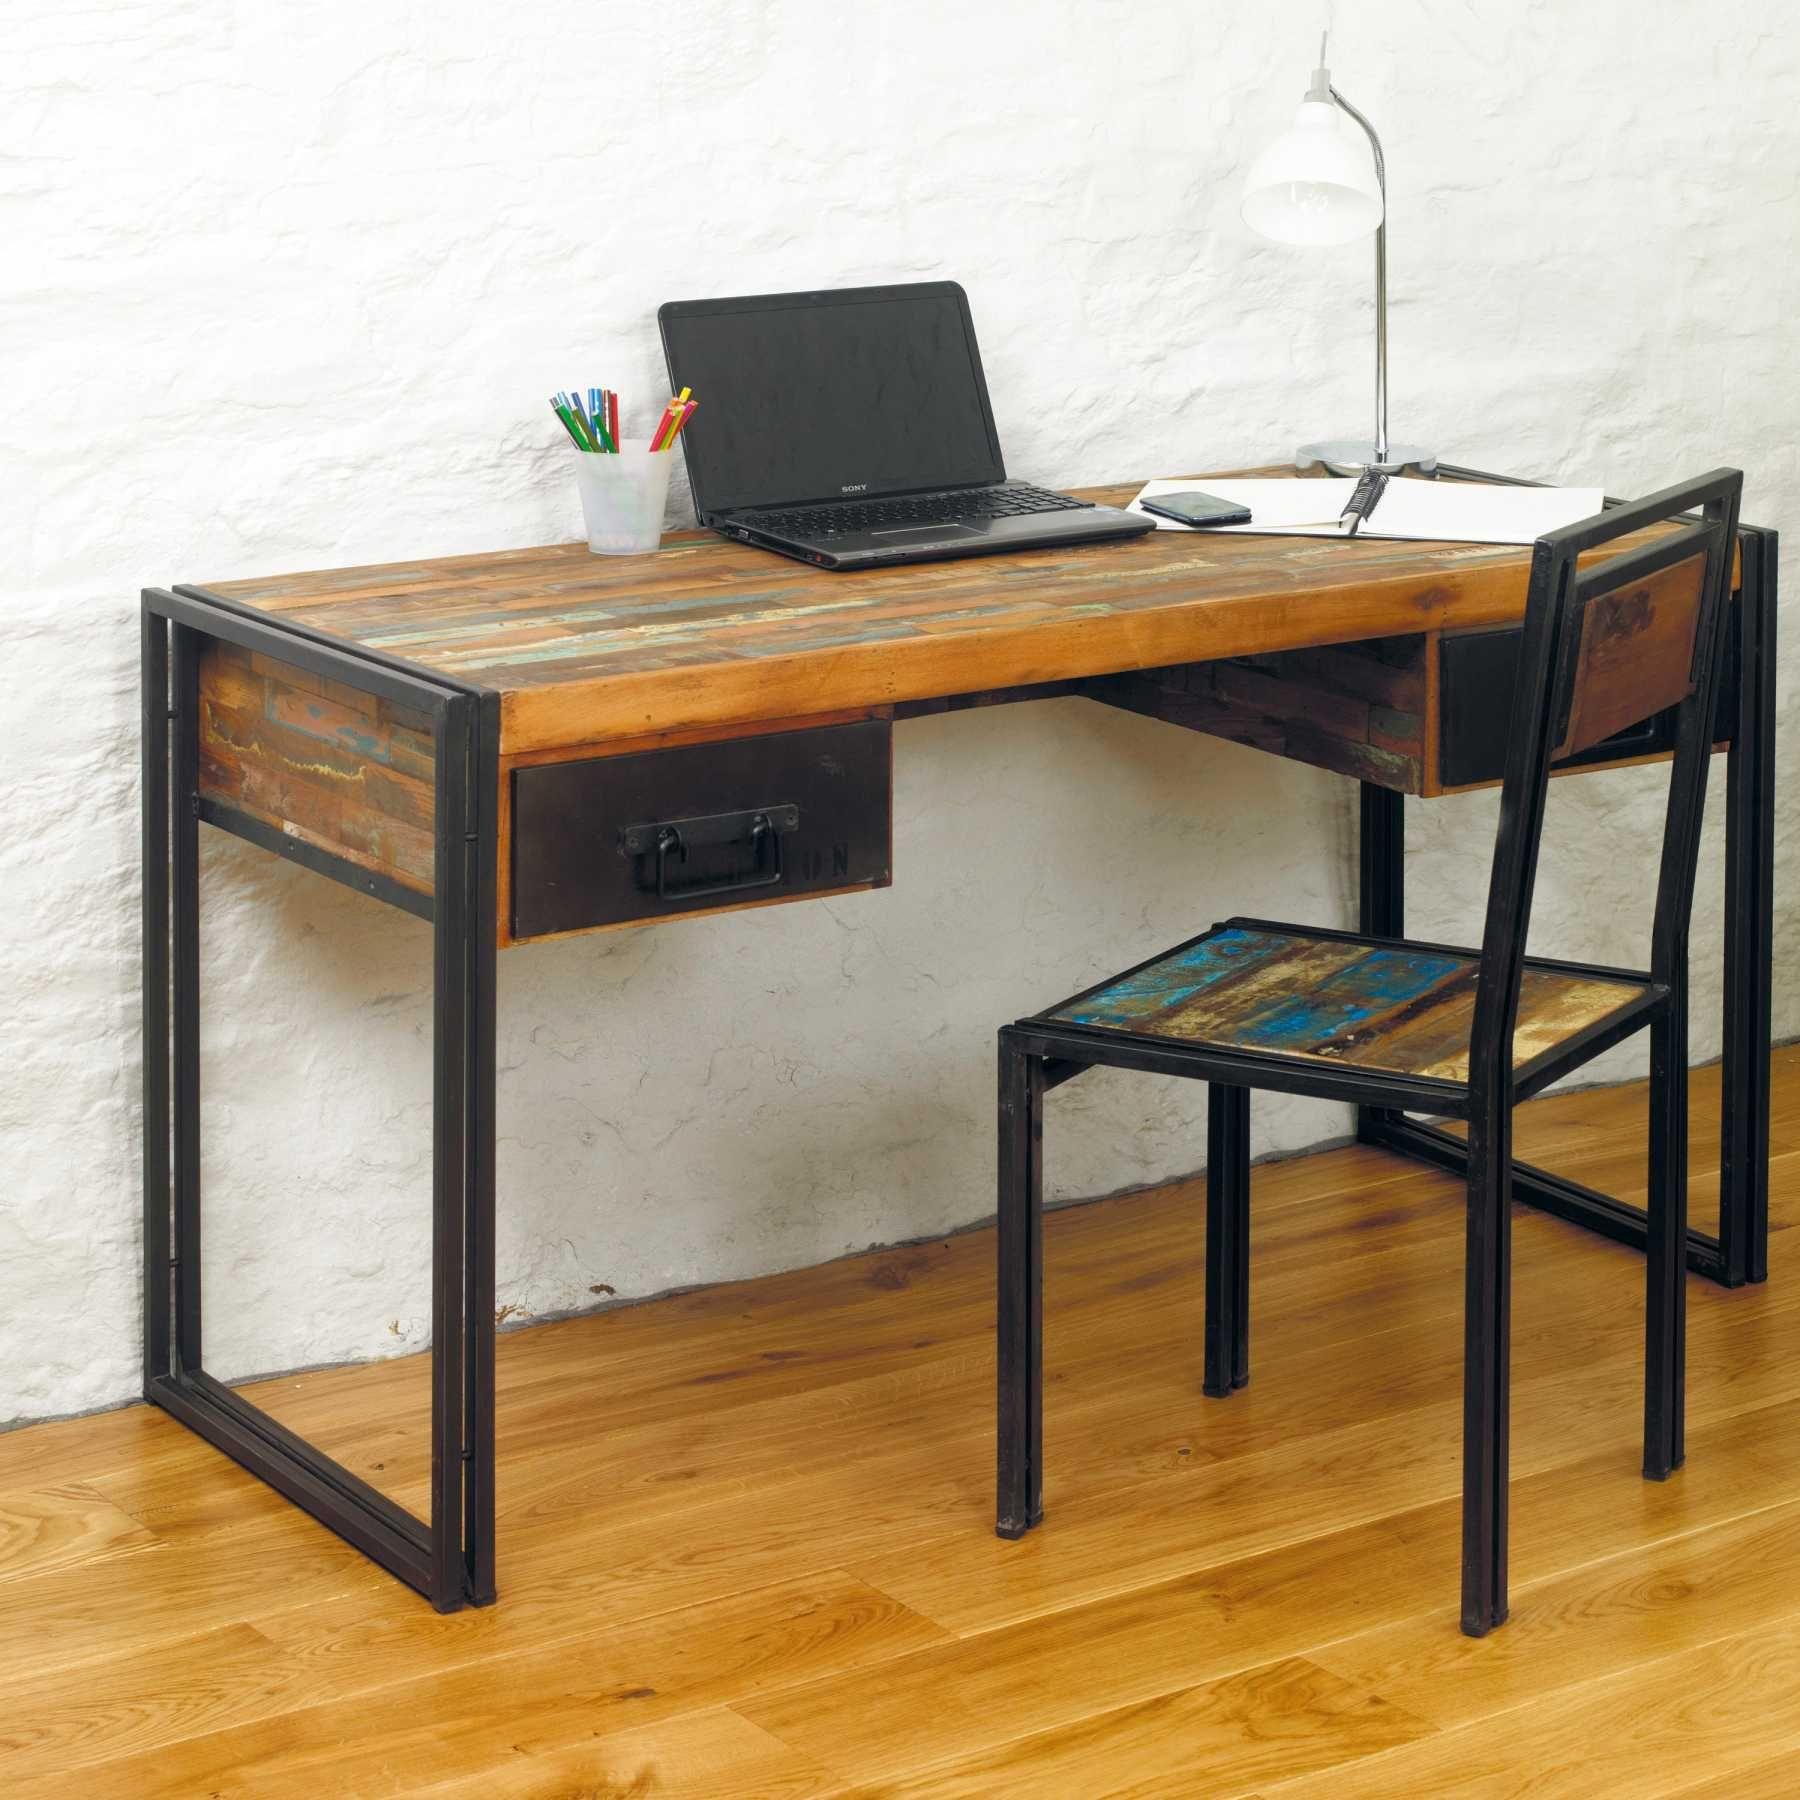 Industrial Computer Desk New Release Chic Computer Desk Home Office Furniture Sets Home Office Furniture